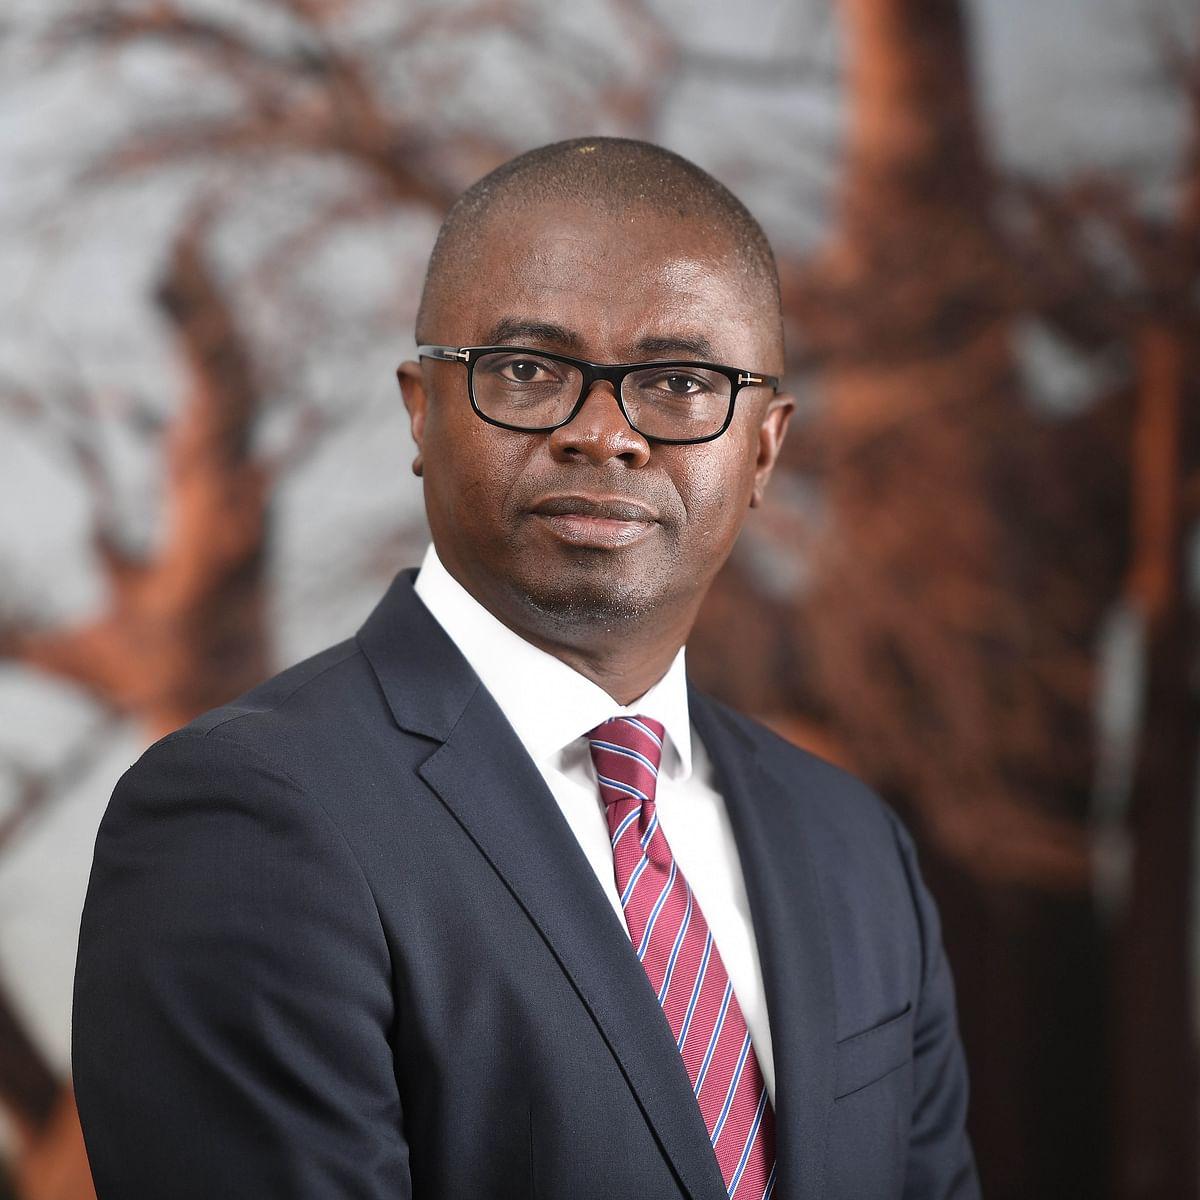 Stanbic Bank Celebrates BIUST Graduates As Beacons Of Progress